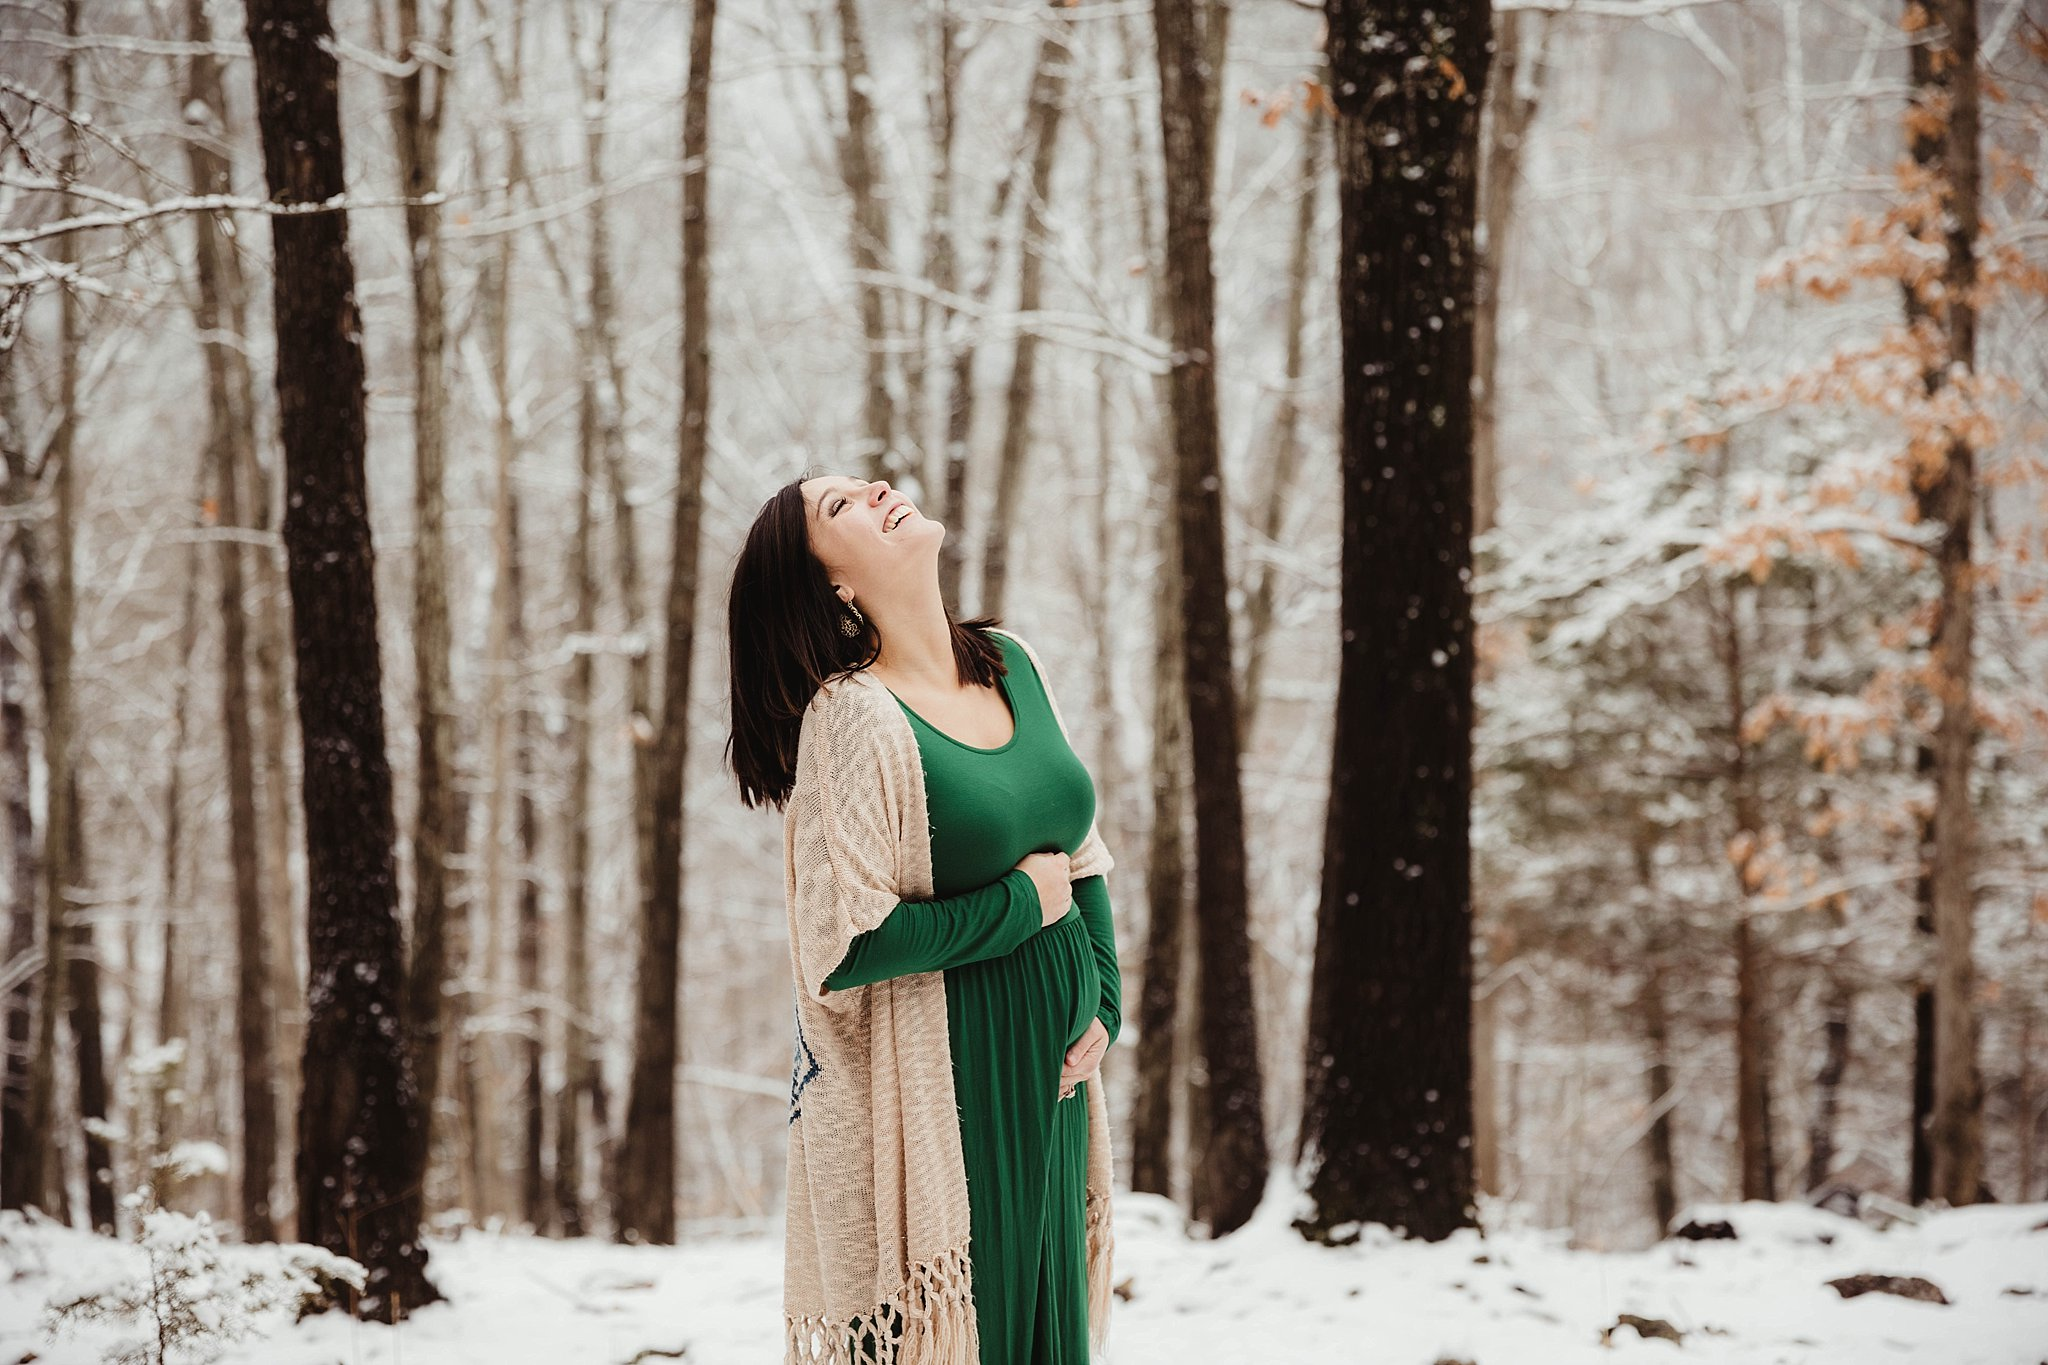 20181227-maternity-photo-outdoor-snow-newborn-picture-best-baby-photographer-missouri-camdenton-03.jpg